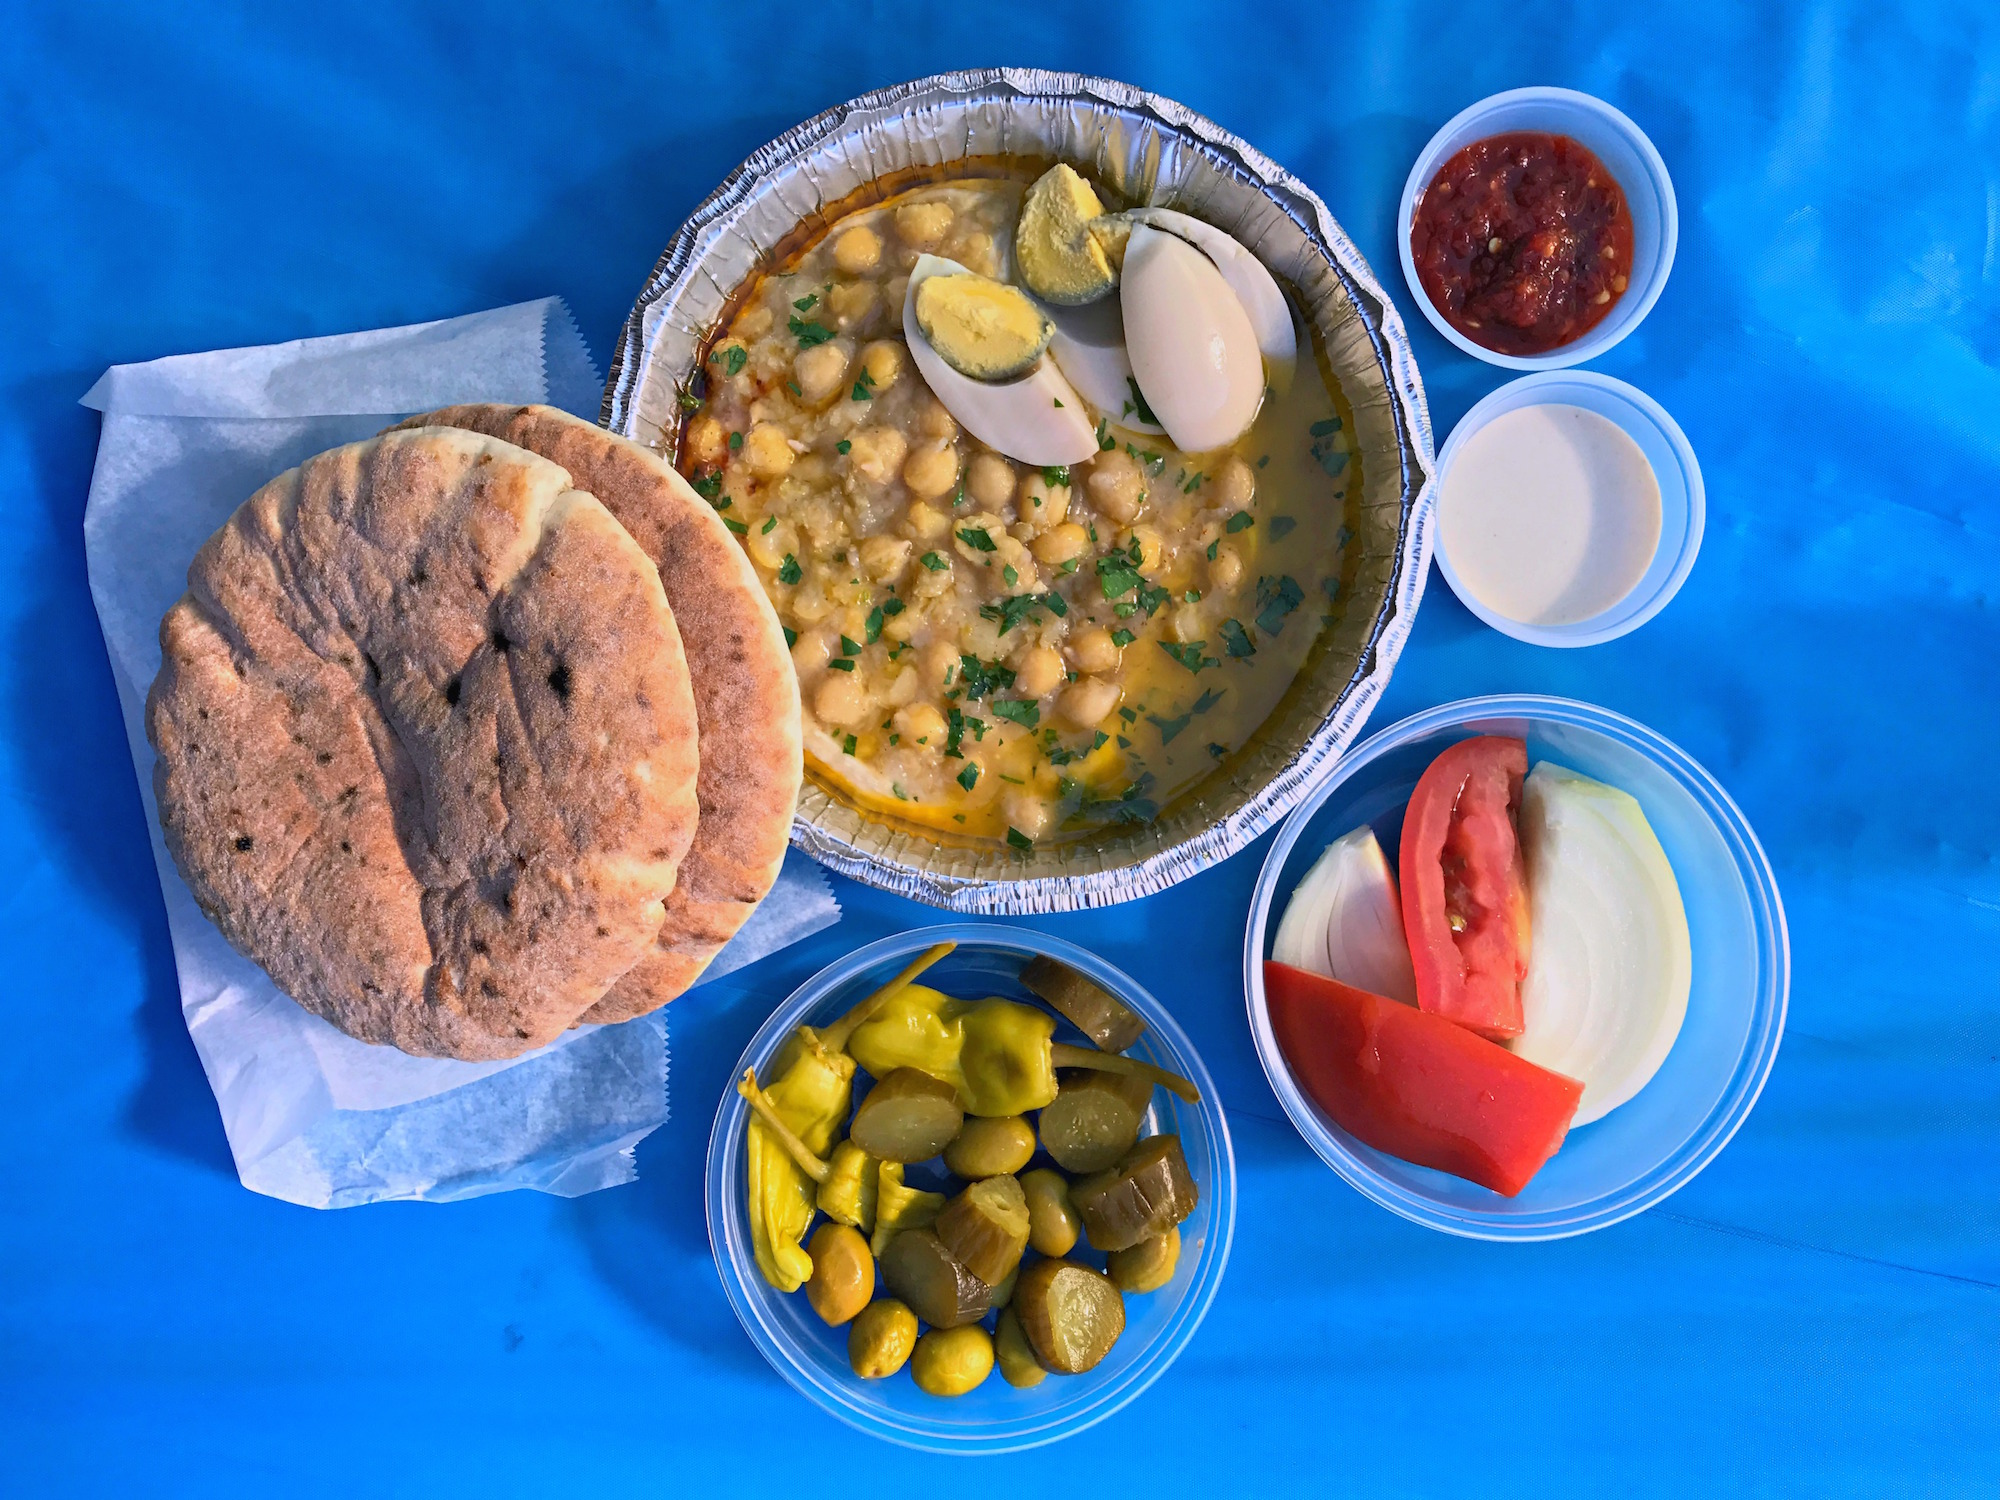 Fan Favorite Israeli Spot Hummus Yummy Lands a Valley Village Storefront